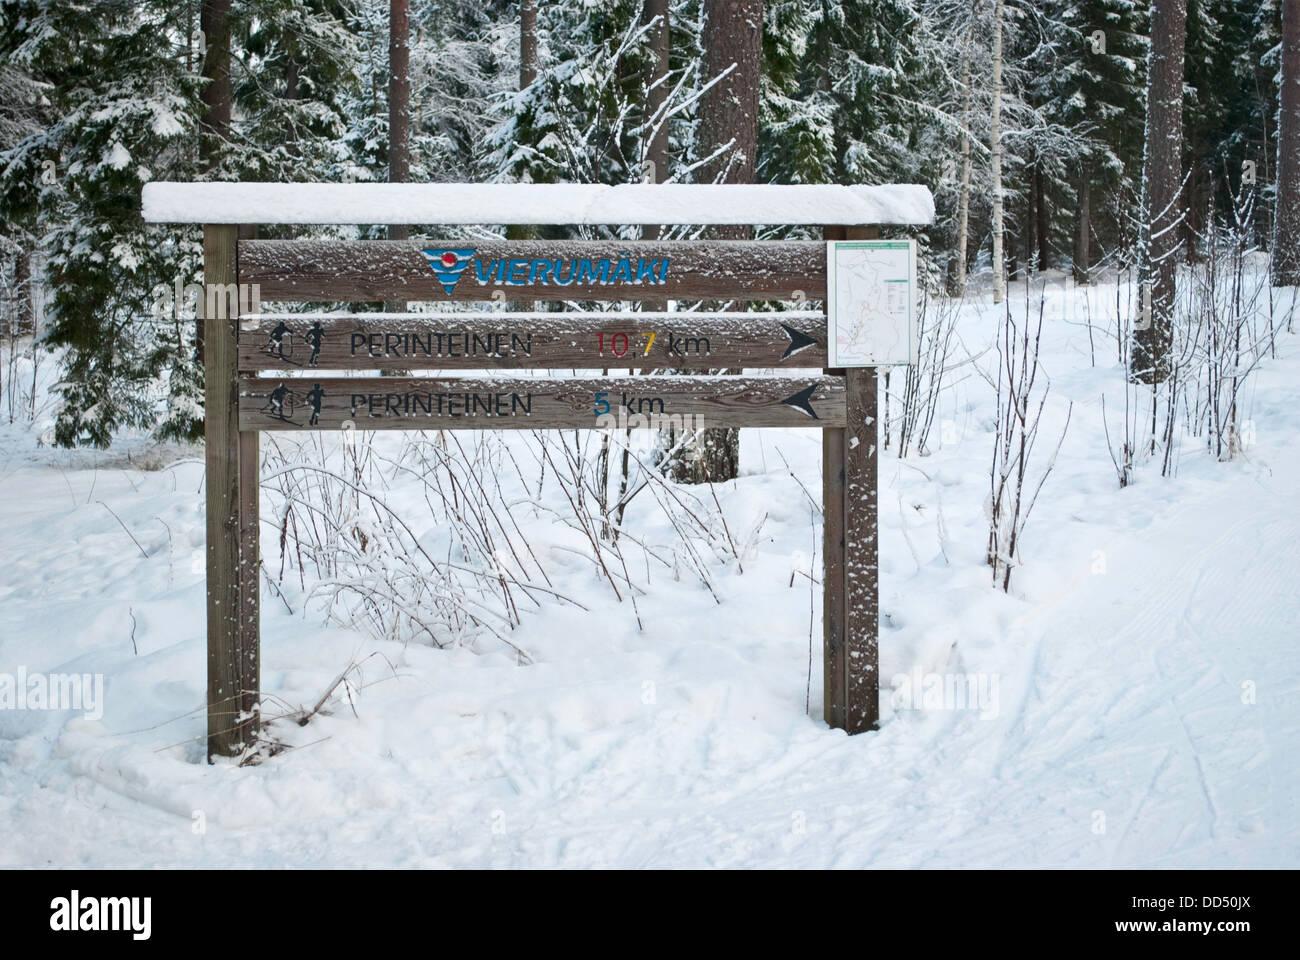 Pointer of the ski-run at the sports center Vierumaki, Finland. - Stock Image